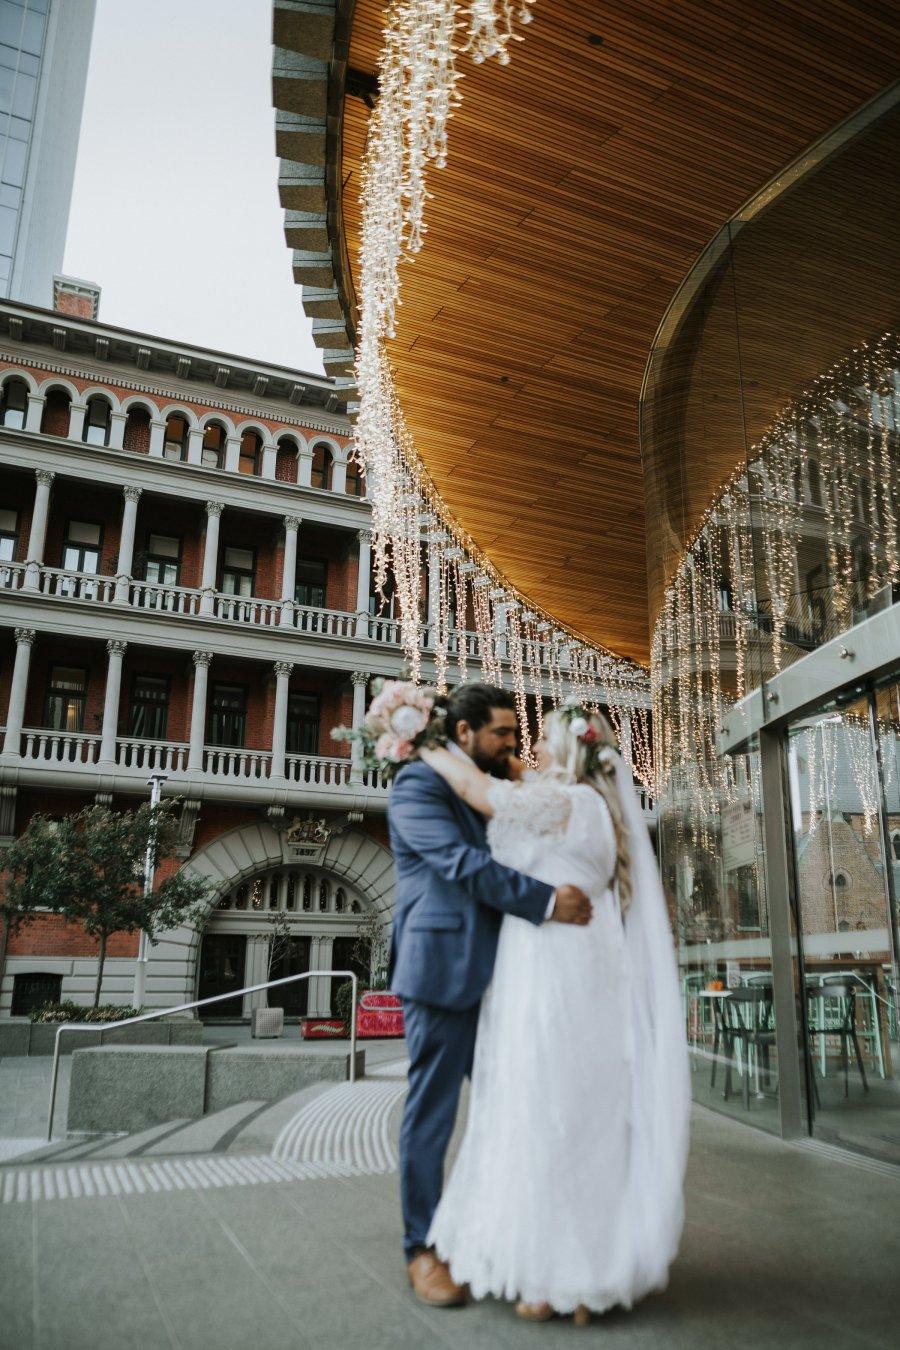 Ebony Blush Photography | Perth wedding Photographer | Perth City Farm Wedding | Imogen + Tristian114